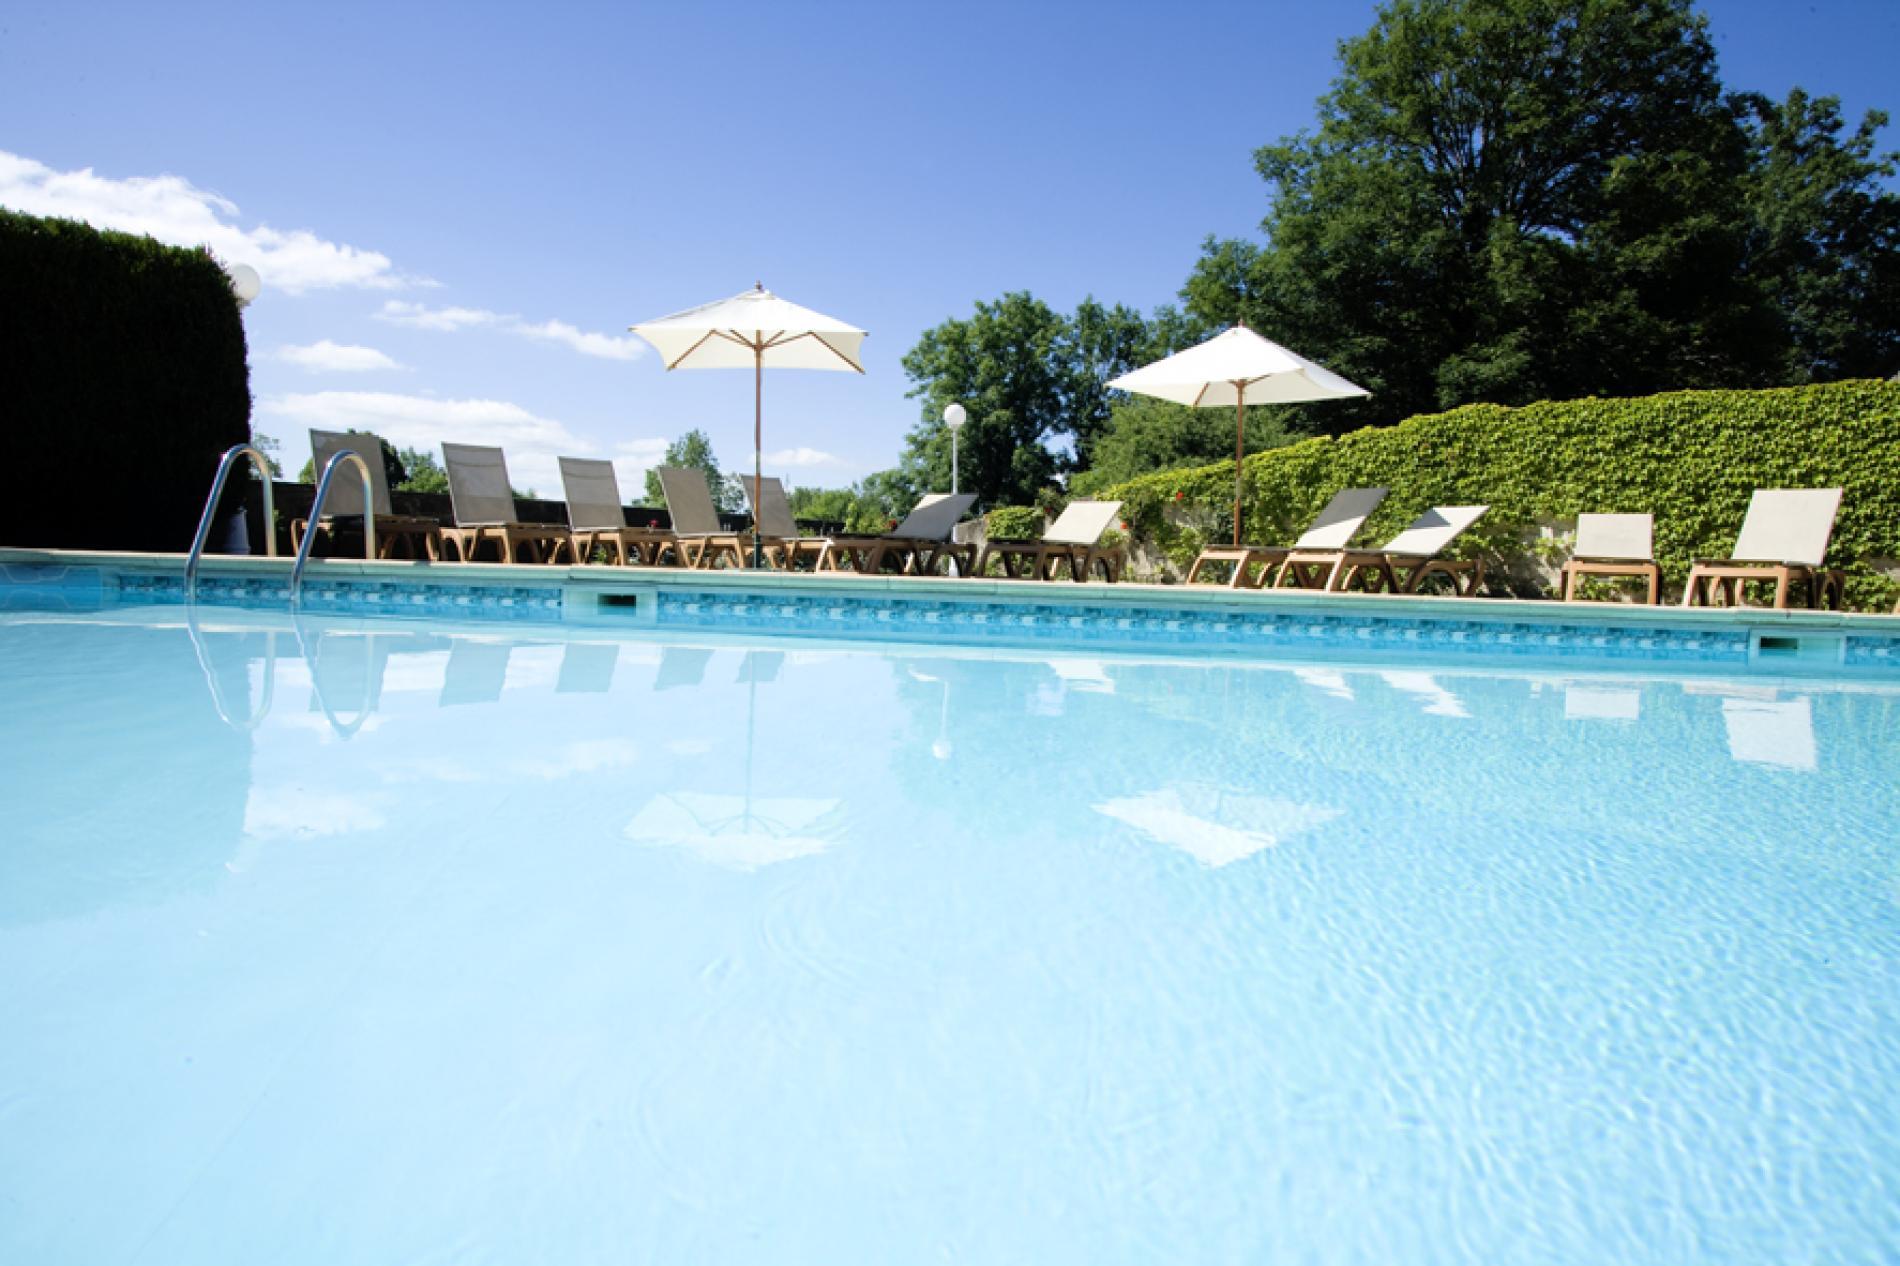 Wellness barn - Fleurs de Montagne SPA and swimming pool, Cantal